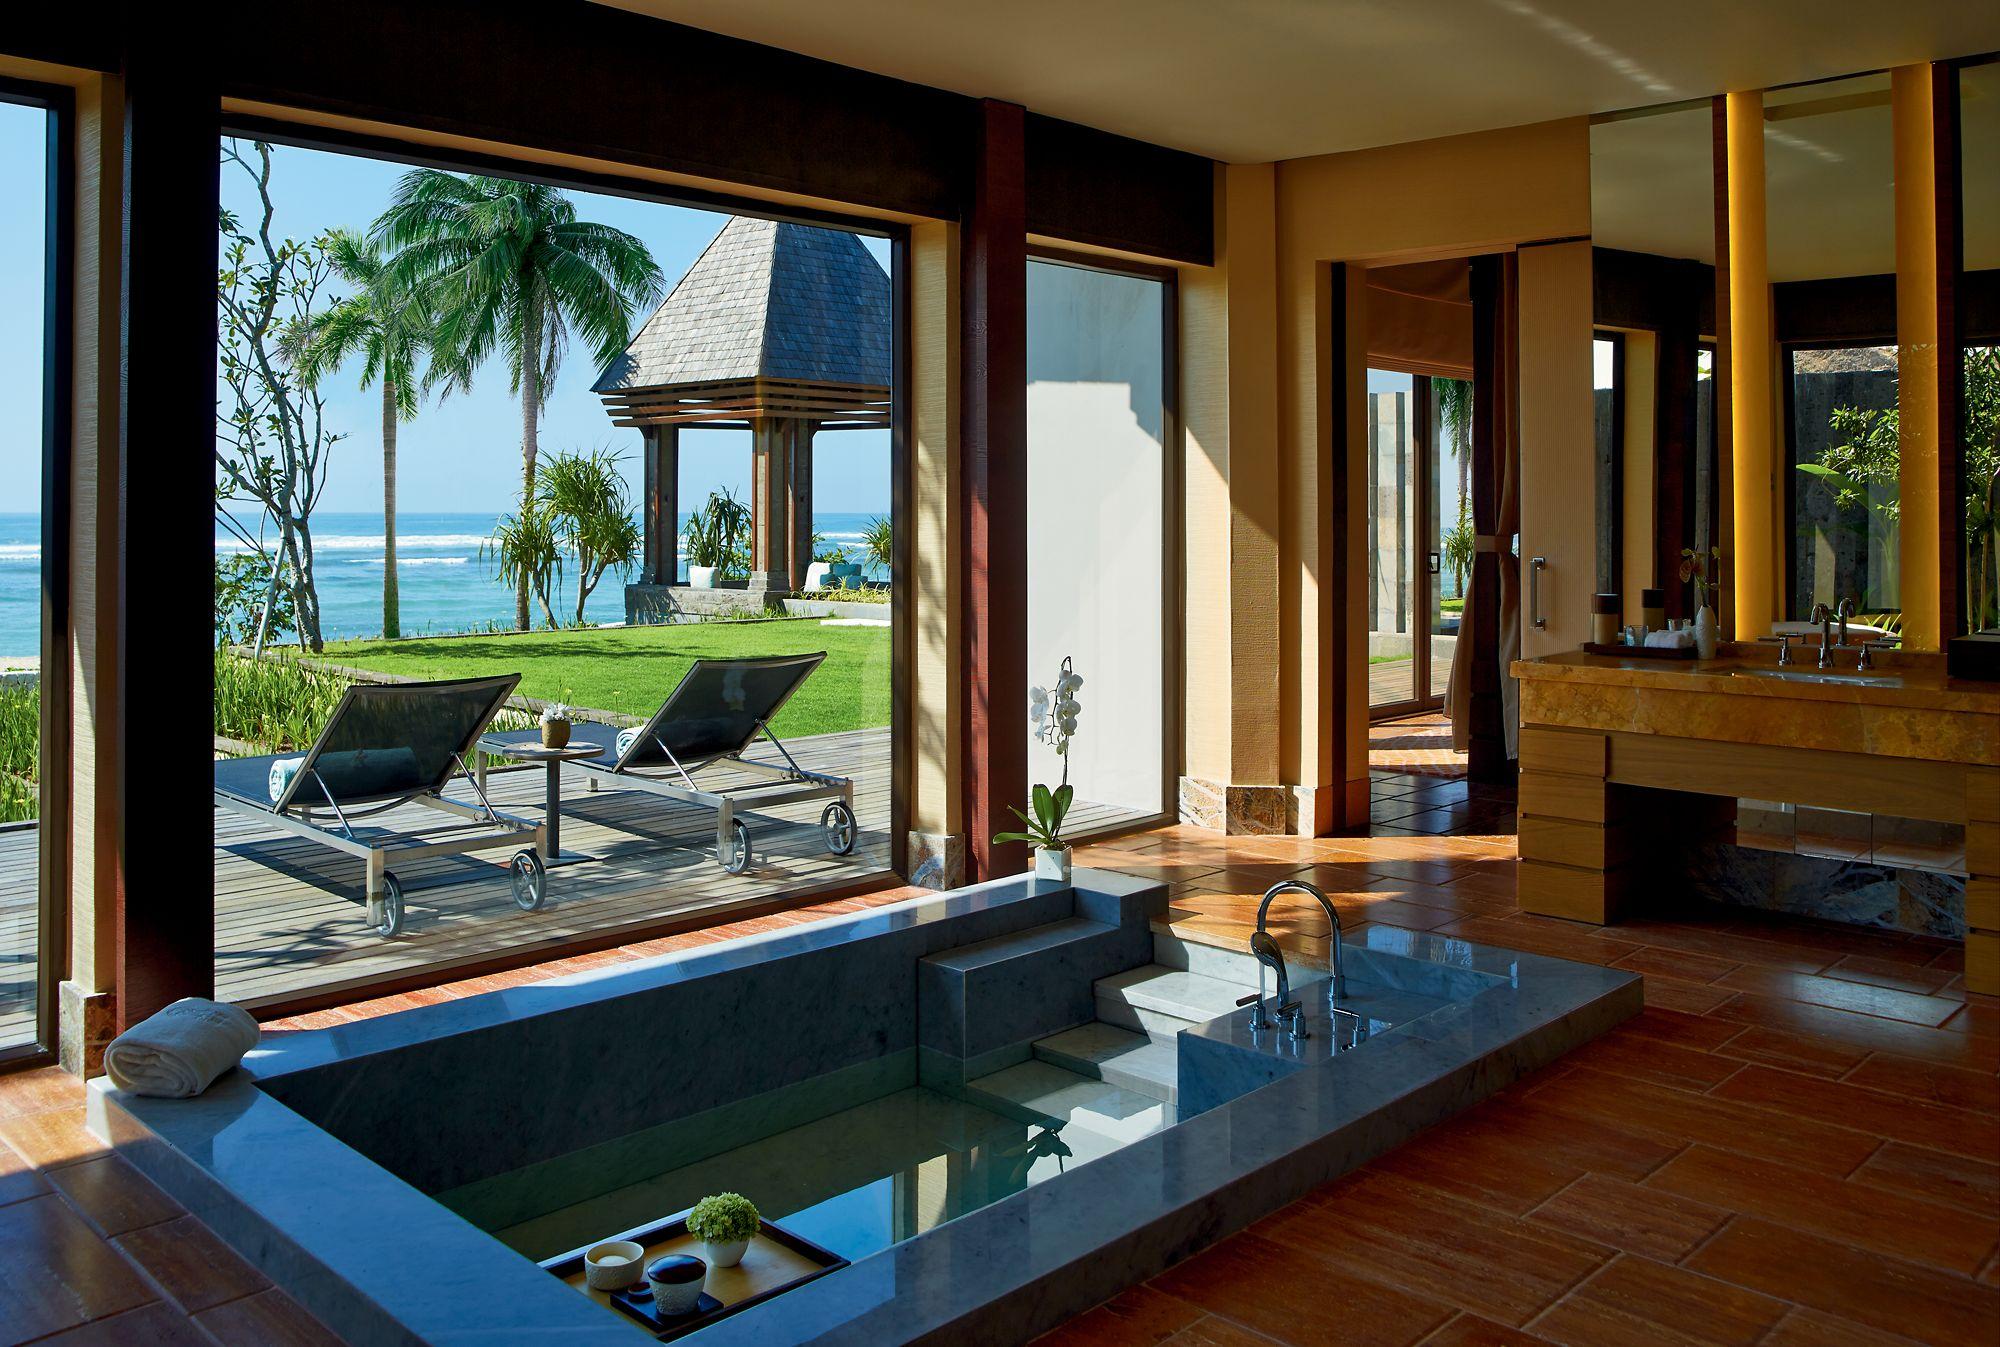 Private Oceanfront Villa In Nusa Dua Bali The Ritz Carlton Bali